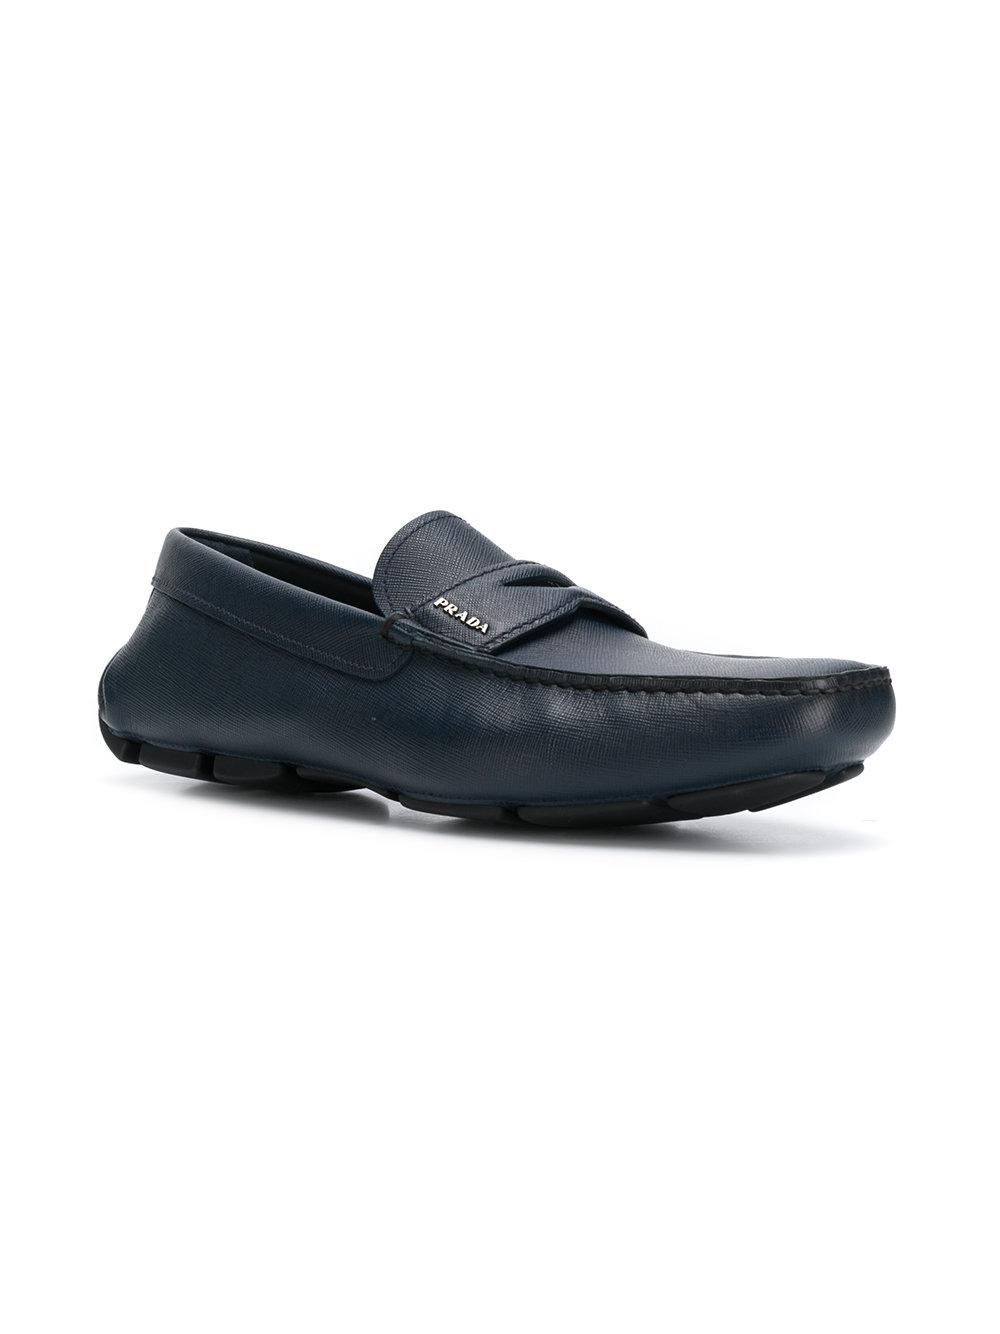 ee5e14f580e Lyst - Prada Square Toe Loafers in Blue for Men